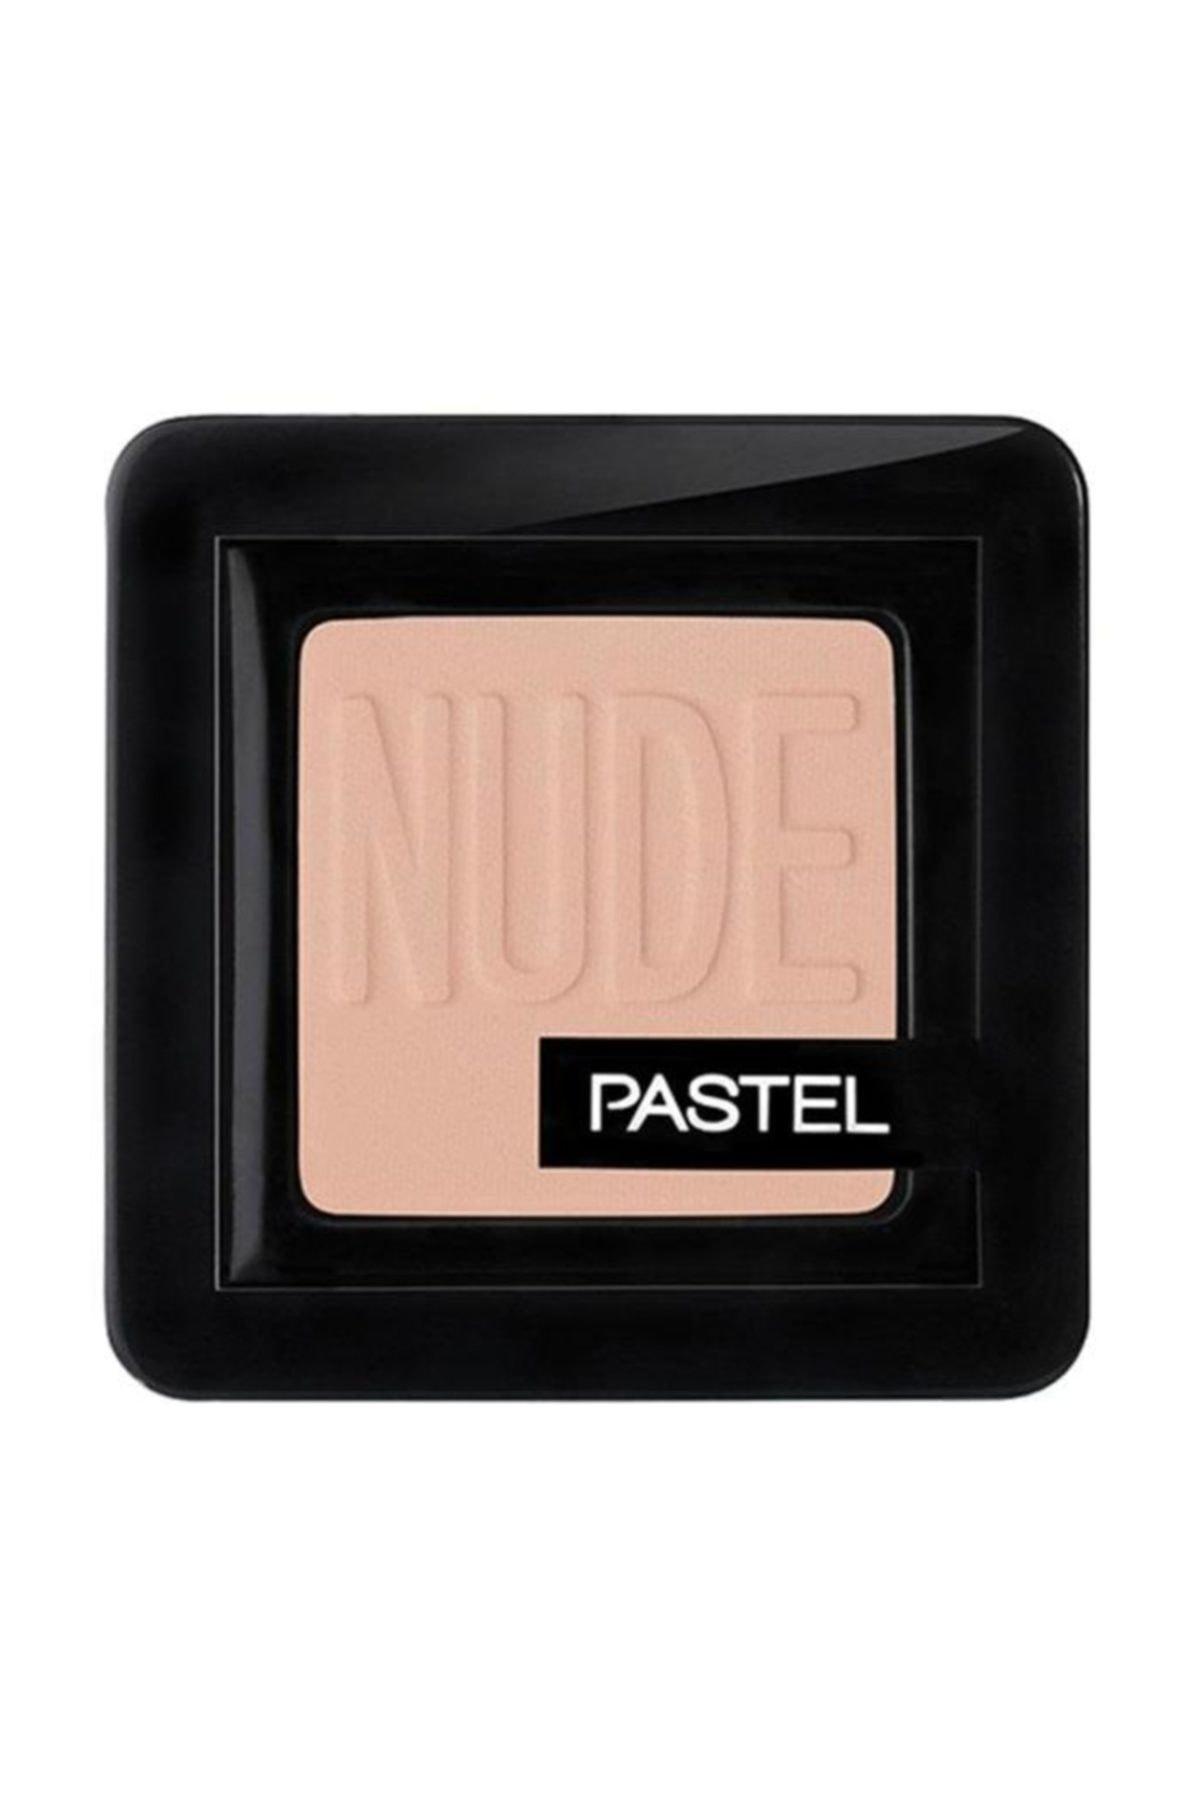 Pastel Göz Farı - Nude Single Eyeshadow No 72 8690644017728 1